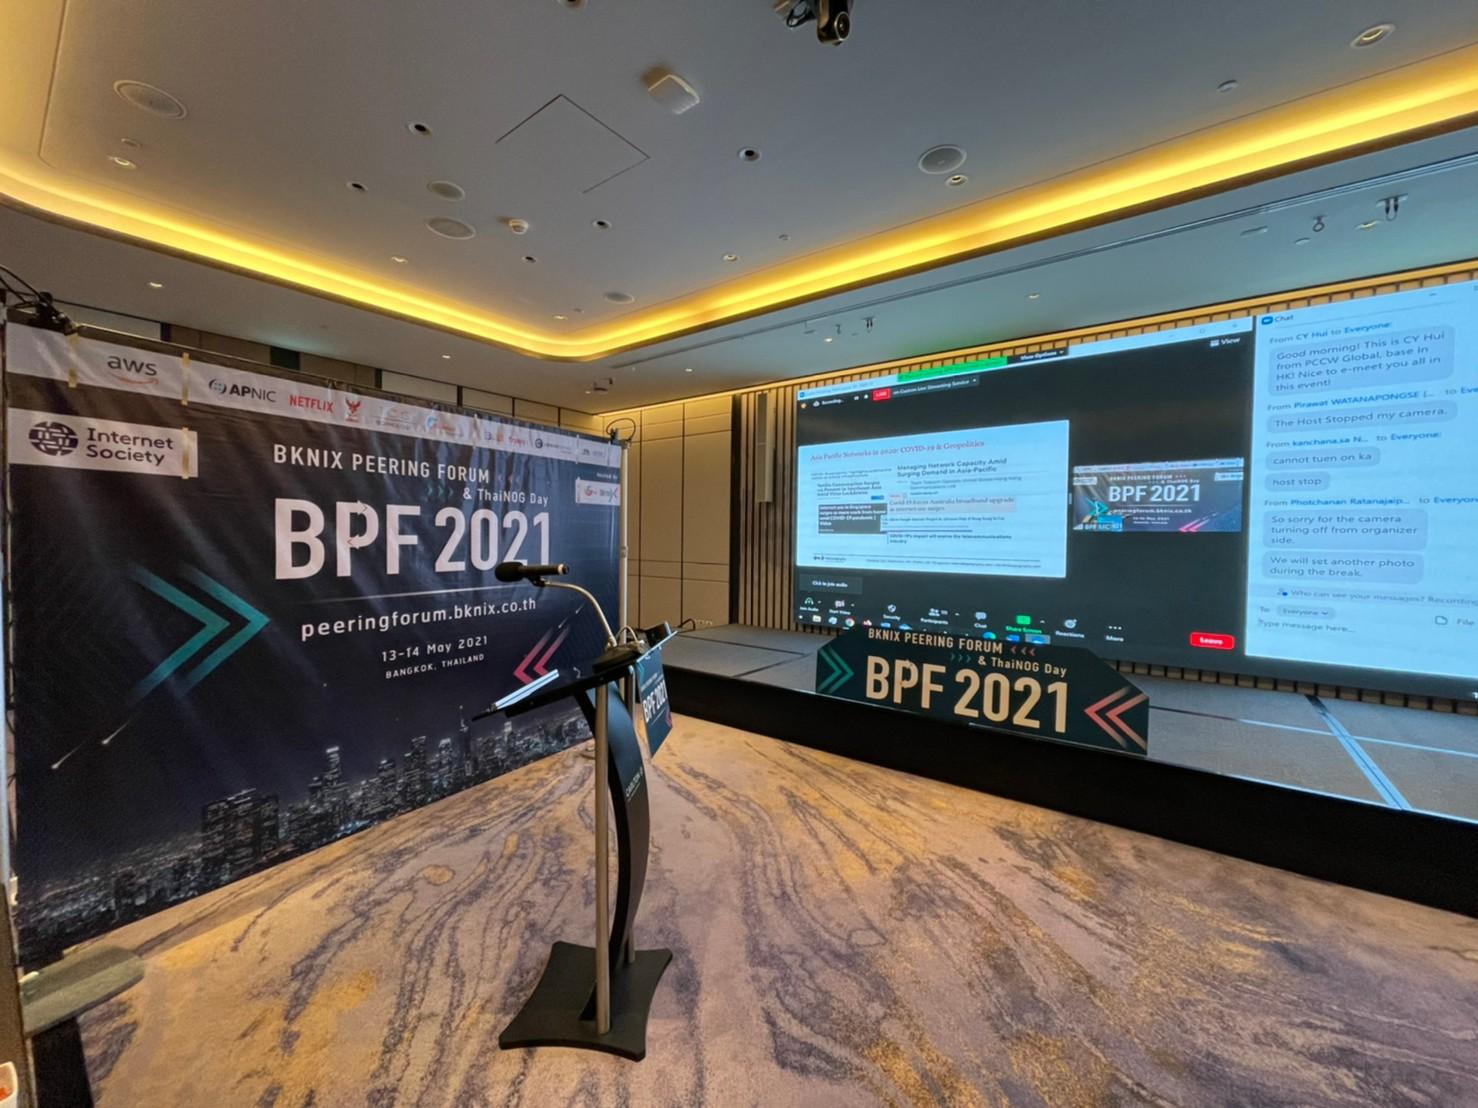 bpf2021-img0049